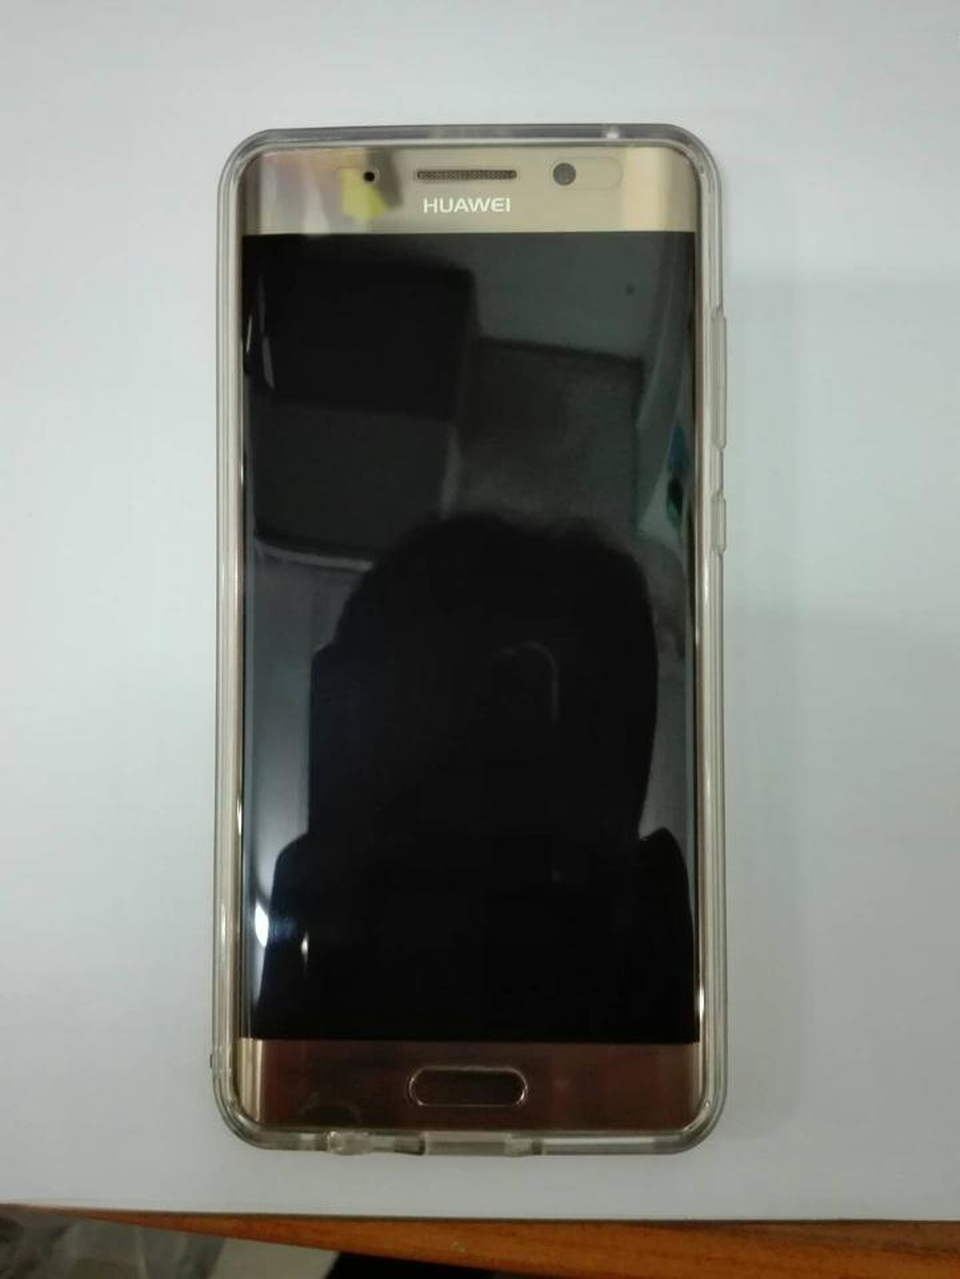 Huawei 9 Pro รูปที่ 1